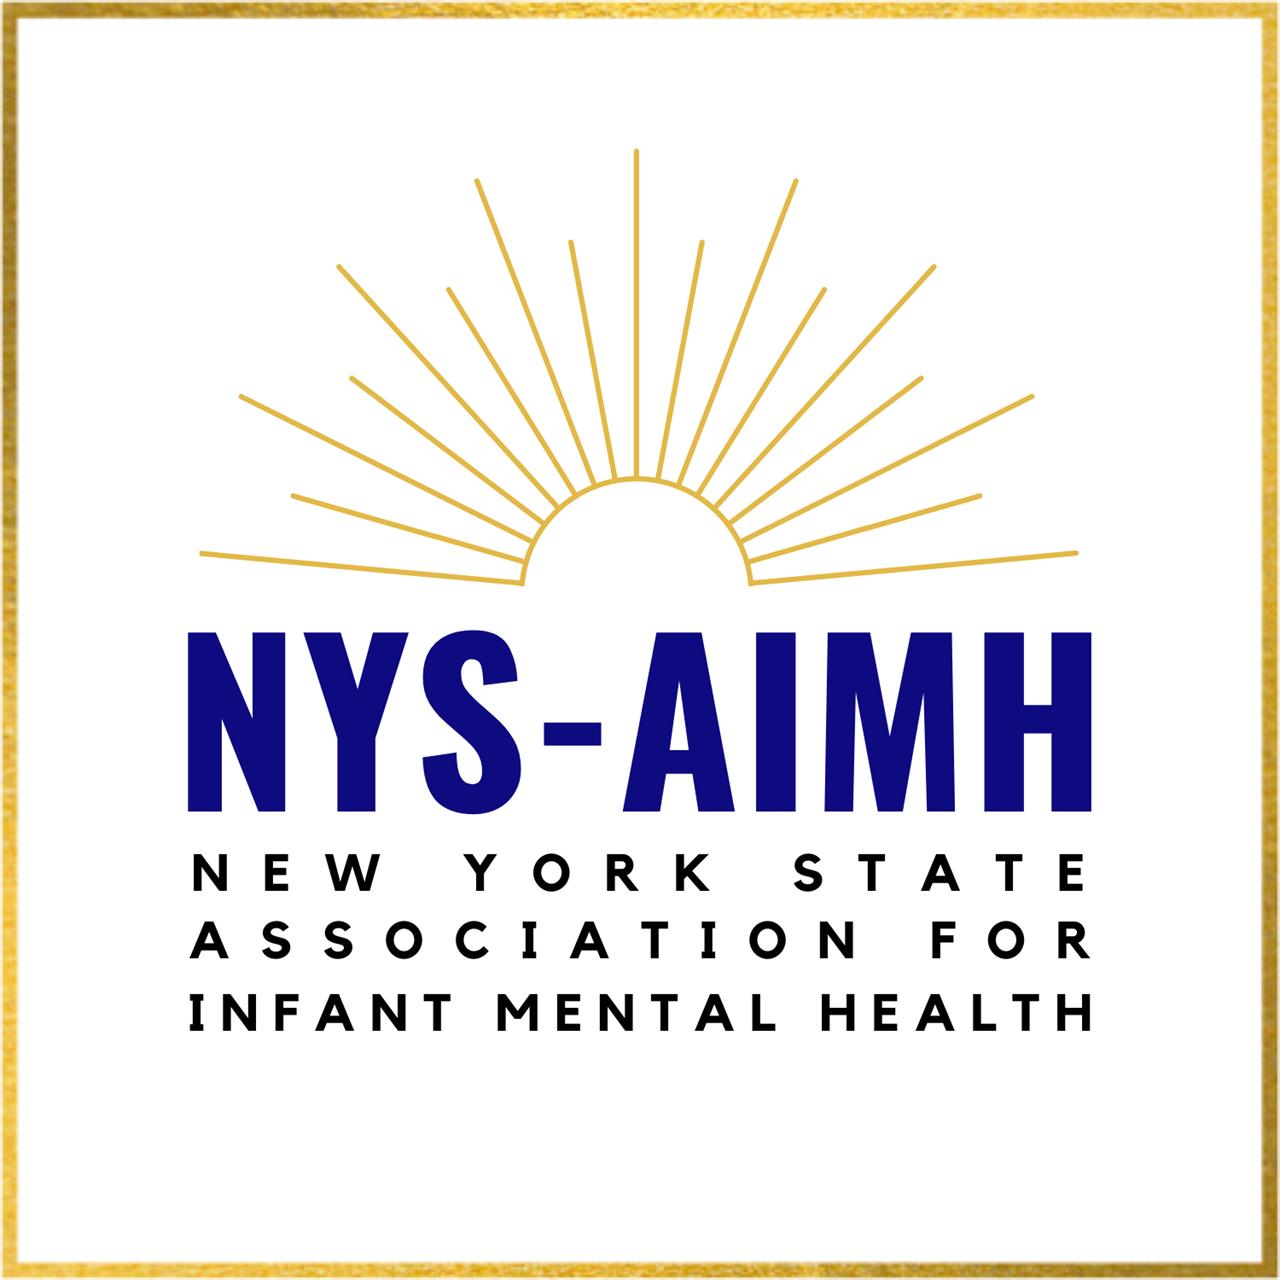 New York State Association for Infant Mental Health